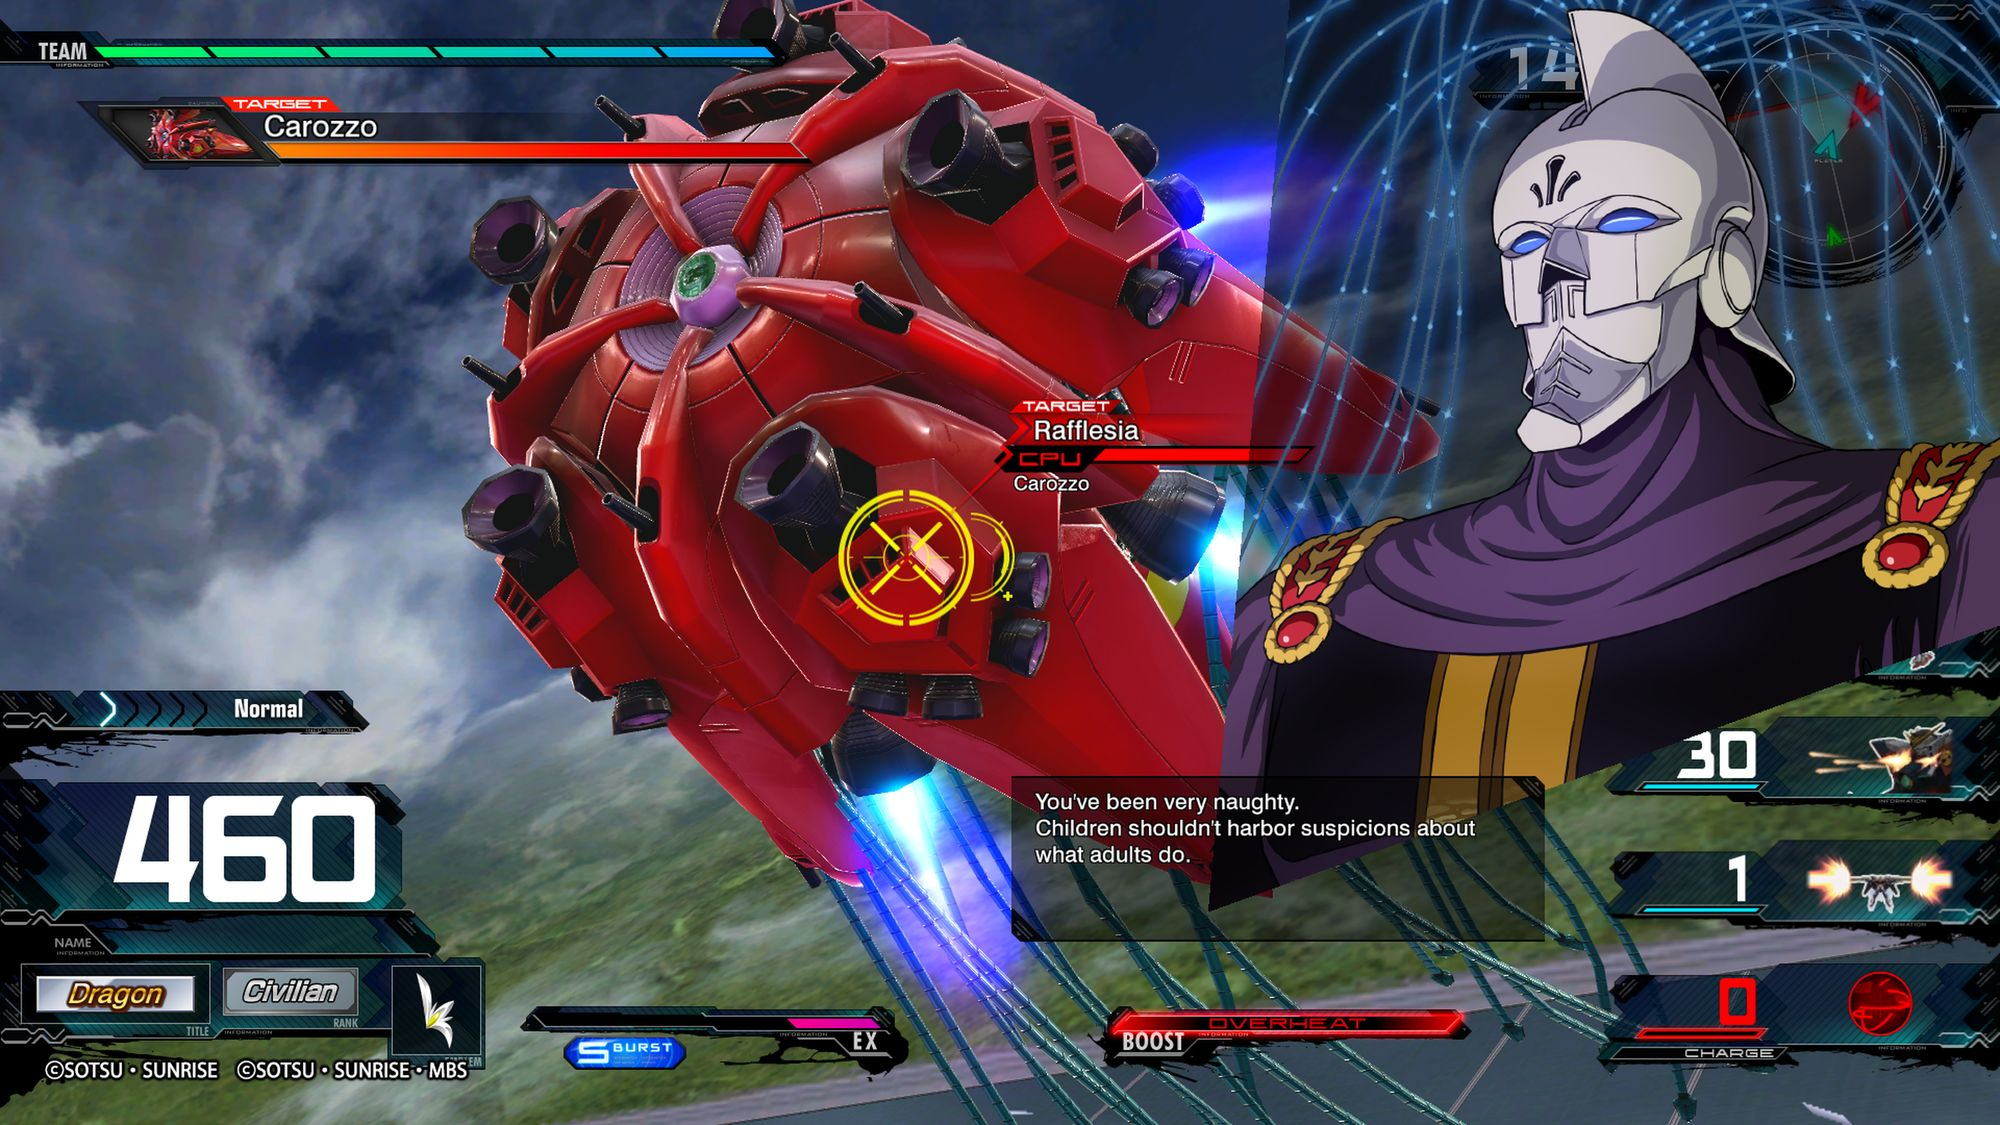 Rafflesia, Gundam F91 - MOBILE SUIT GUNDAM EXTREME VS. MAXIBOOST ON